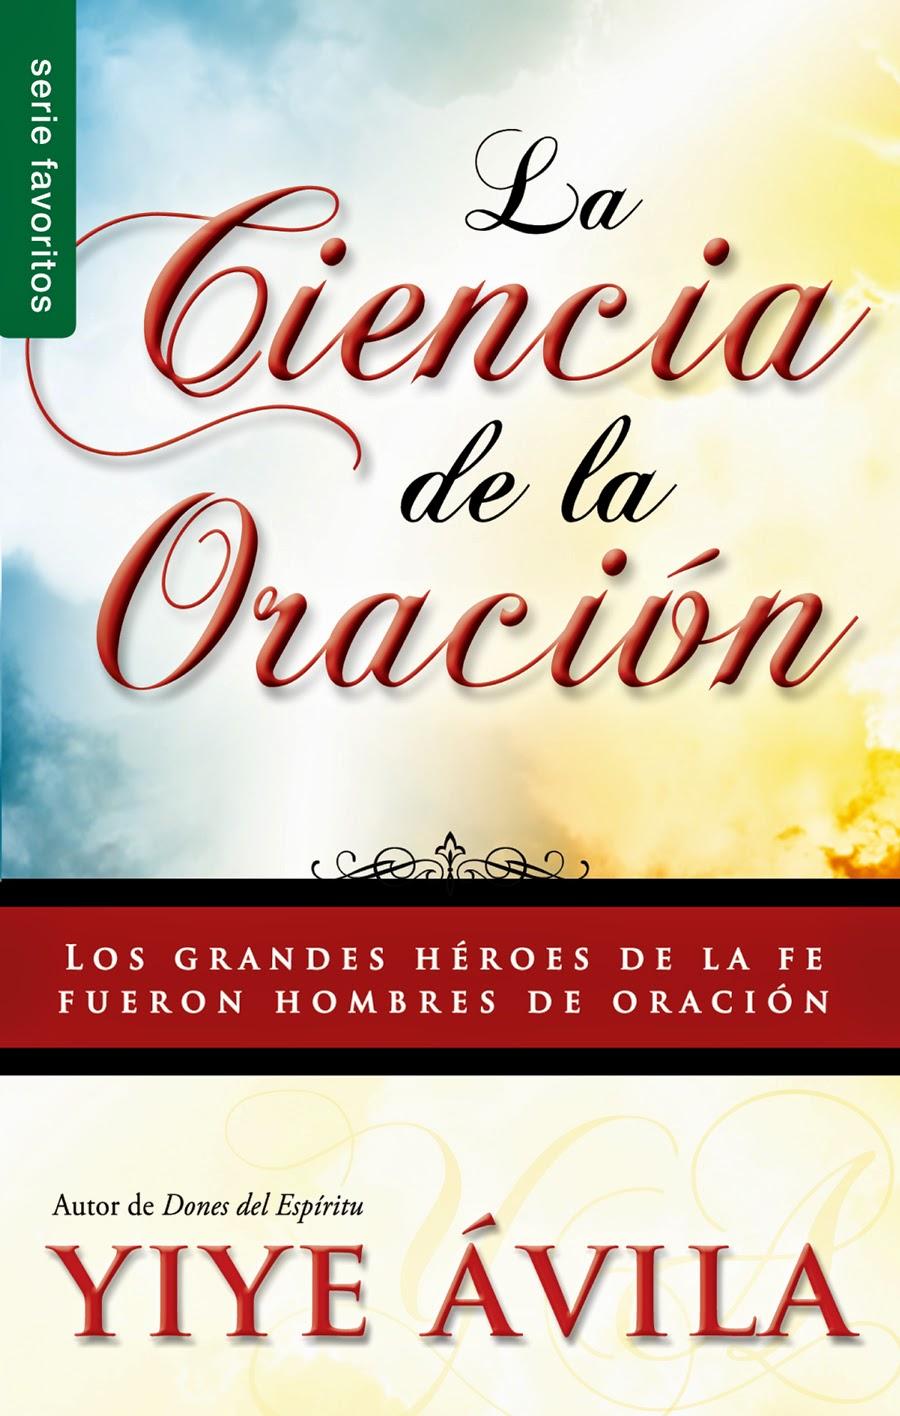 Libros Cristianos [Full PDF] ~ AgustinMFullHD ¡Recursos Cristianos!  @tataya.com.mx